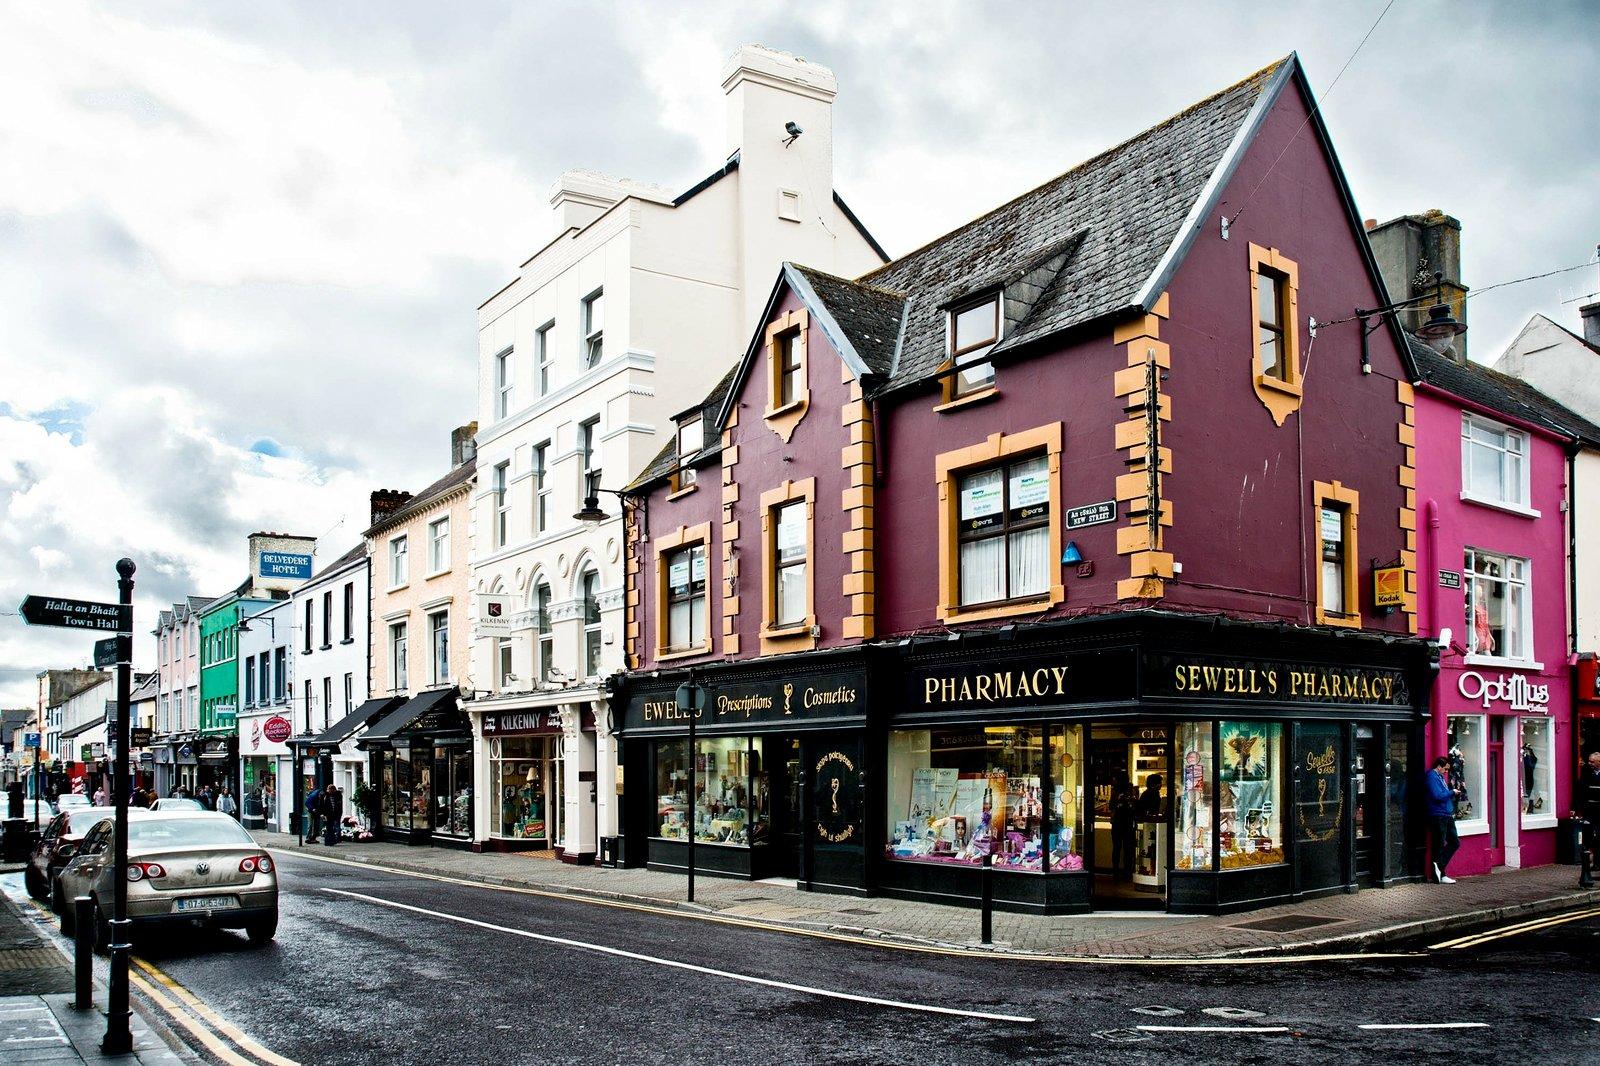 Lettone dating Irlanda